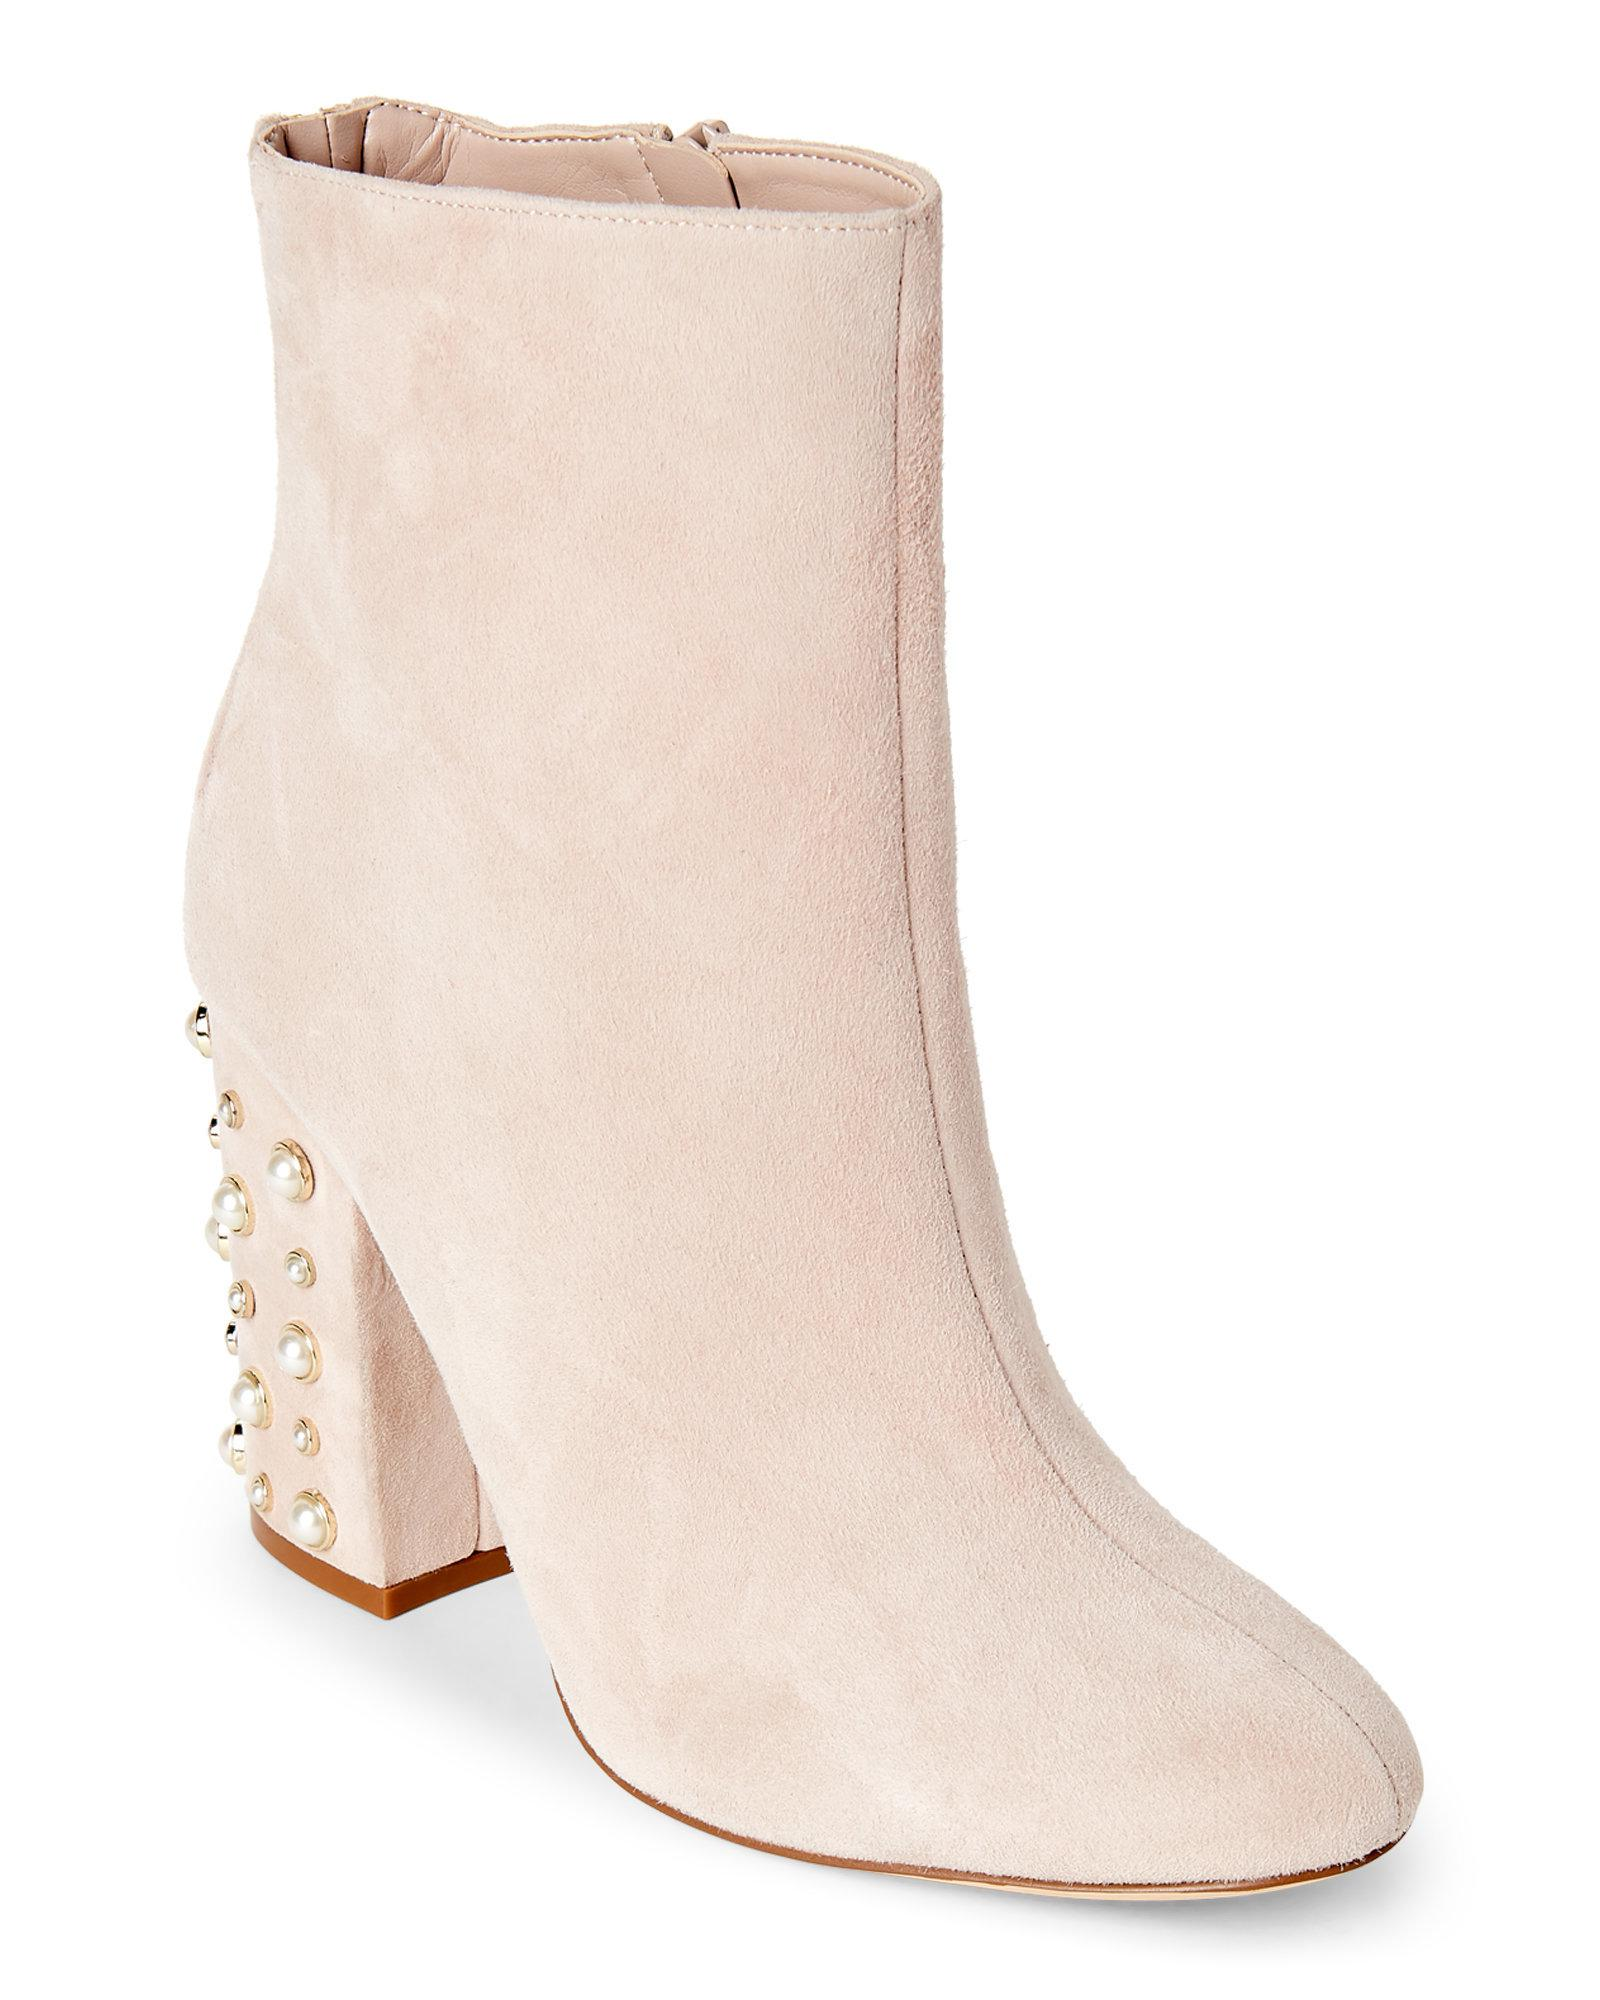 Ivanka Trump Womens Telora Leather Almond Toe Ankle Fashion, Taupe, Size 8.0 rb1